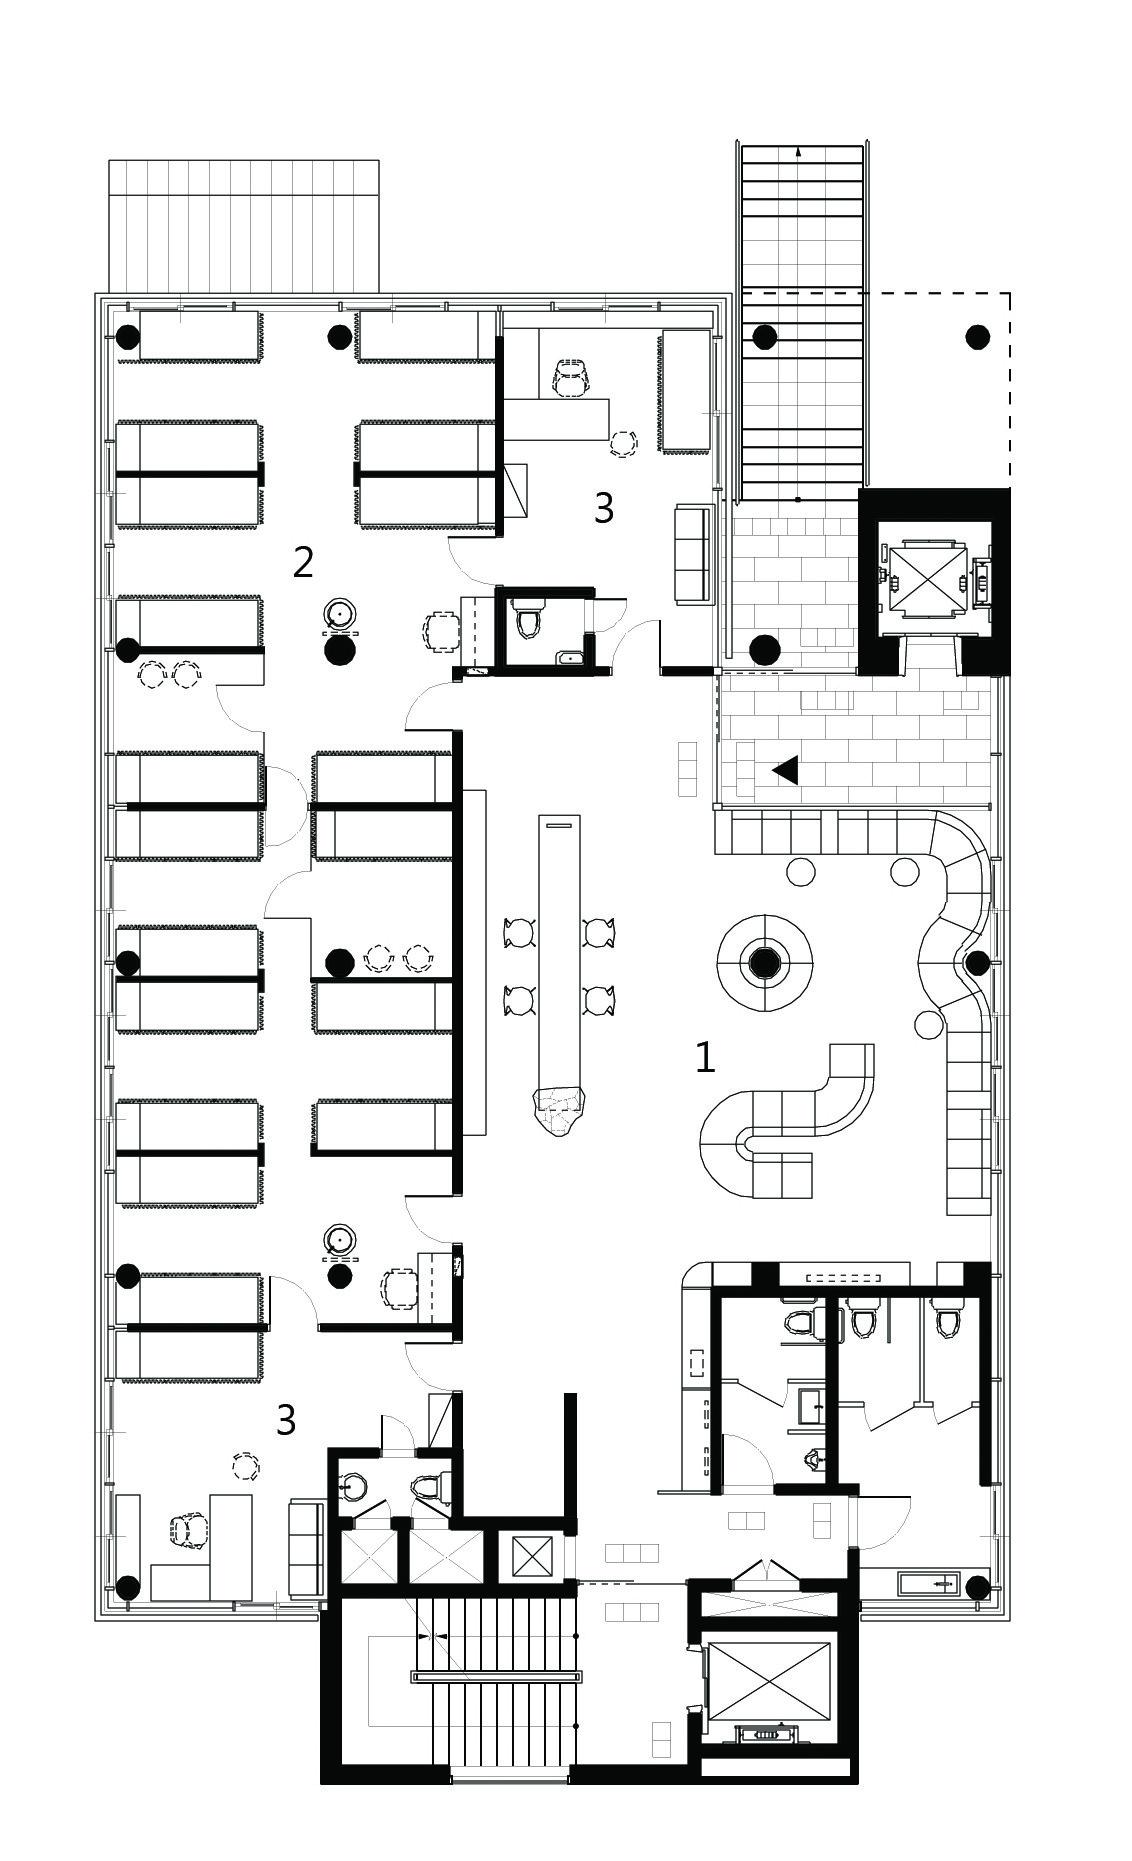 511dcb21b3fc4bd9a2000393 Choonwondang Oriental Clinic Museum Doojin Hwang Architects 2nd Floor Plan on Chiropractic Office Layout Design